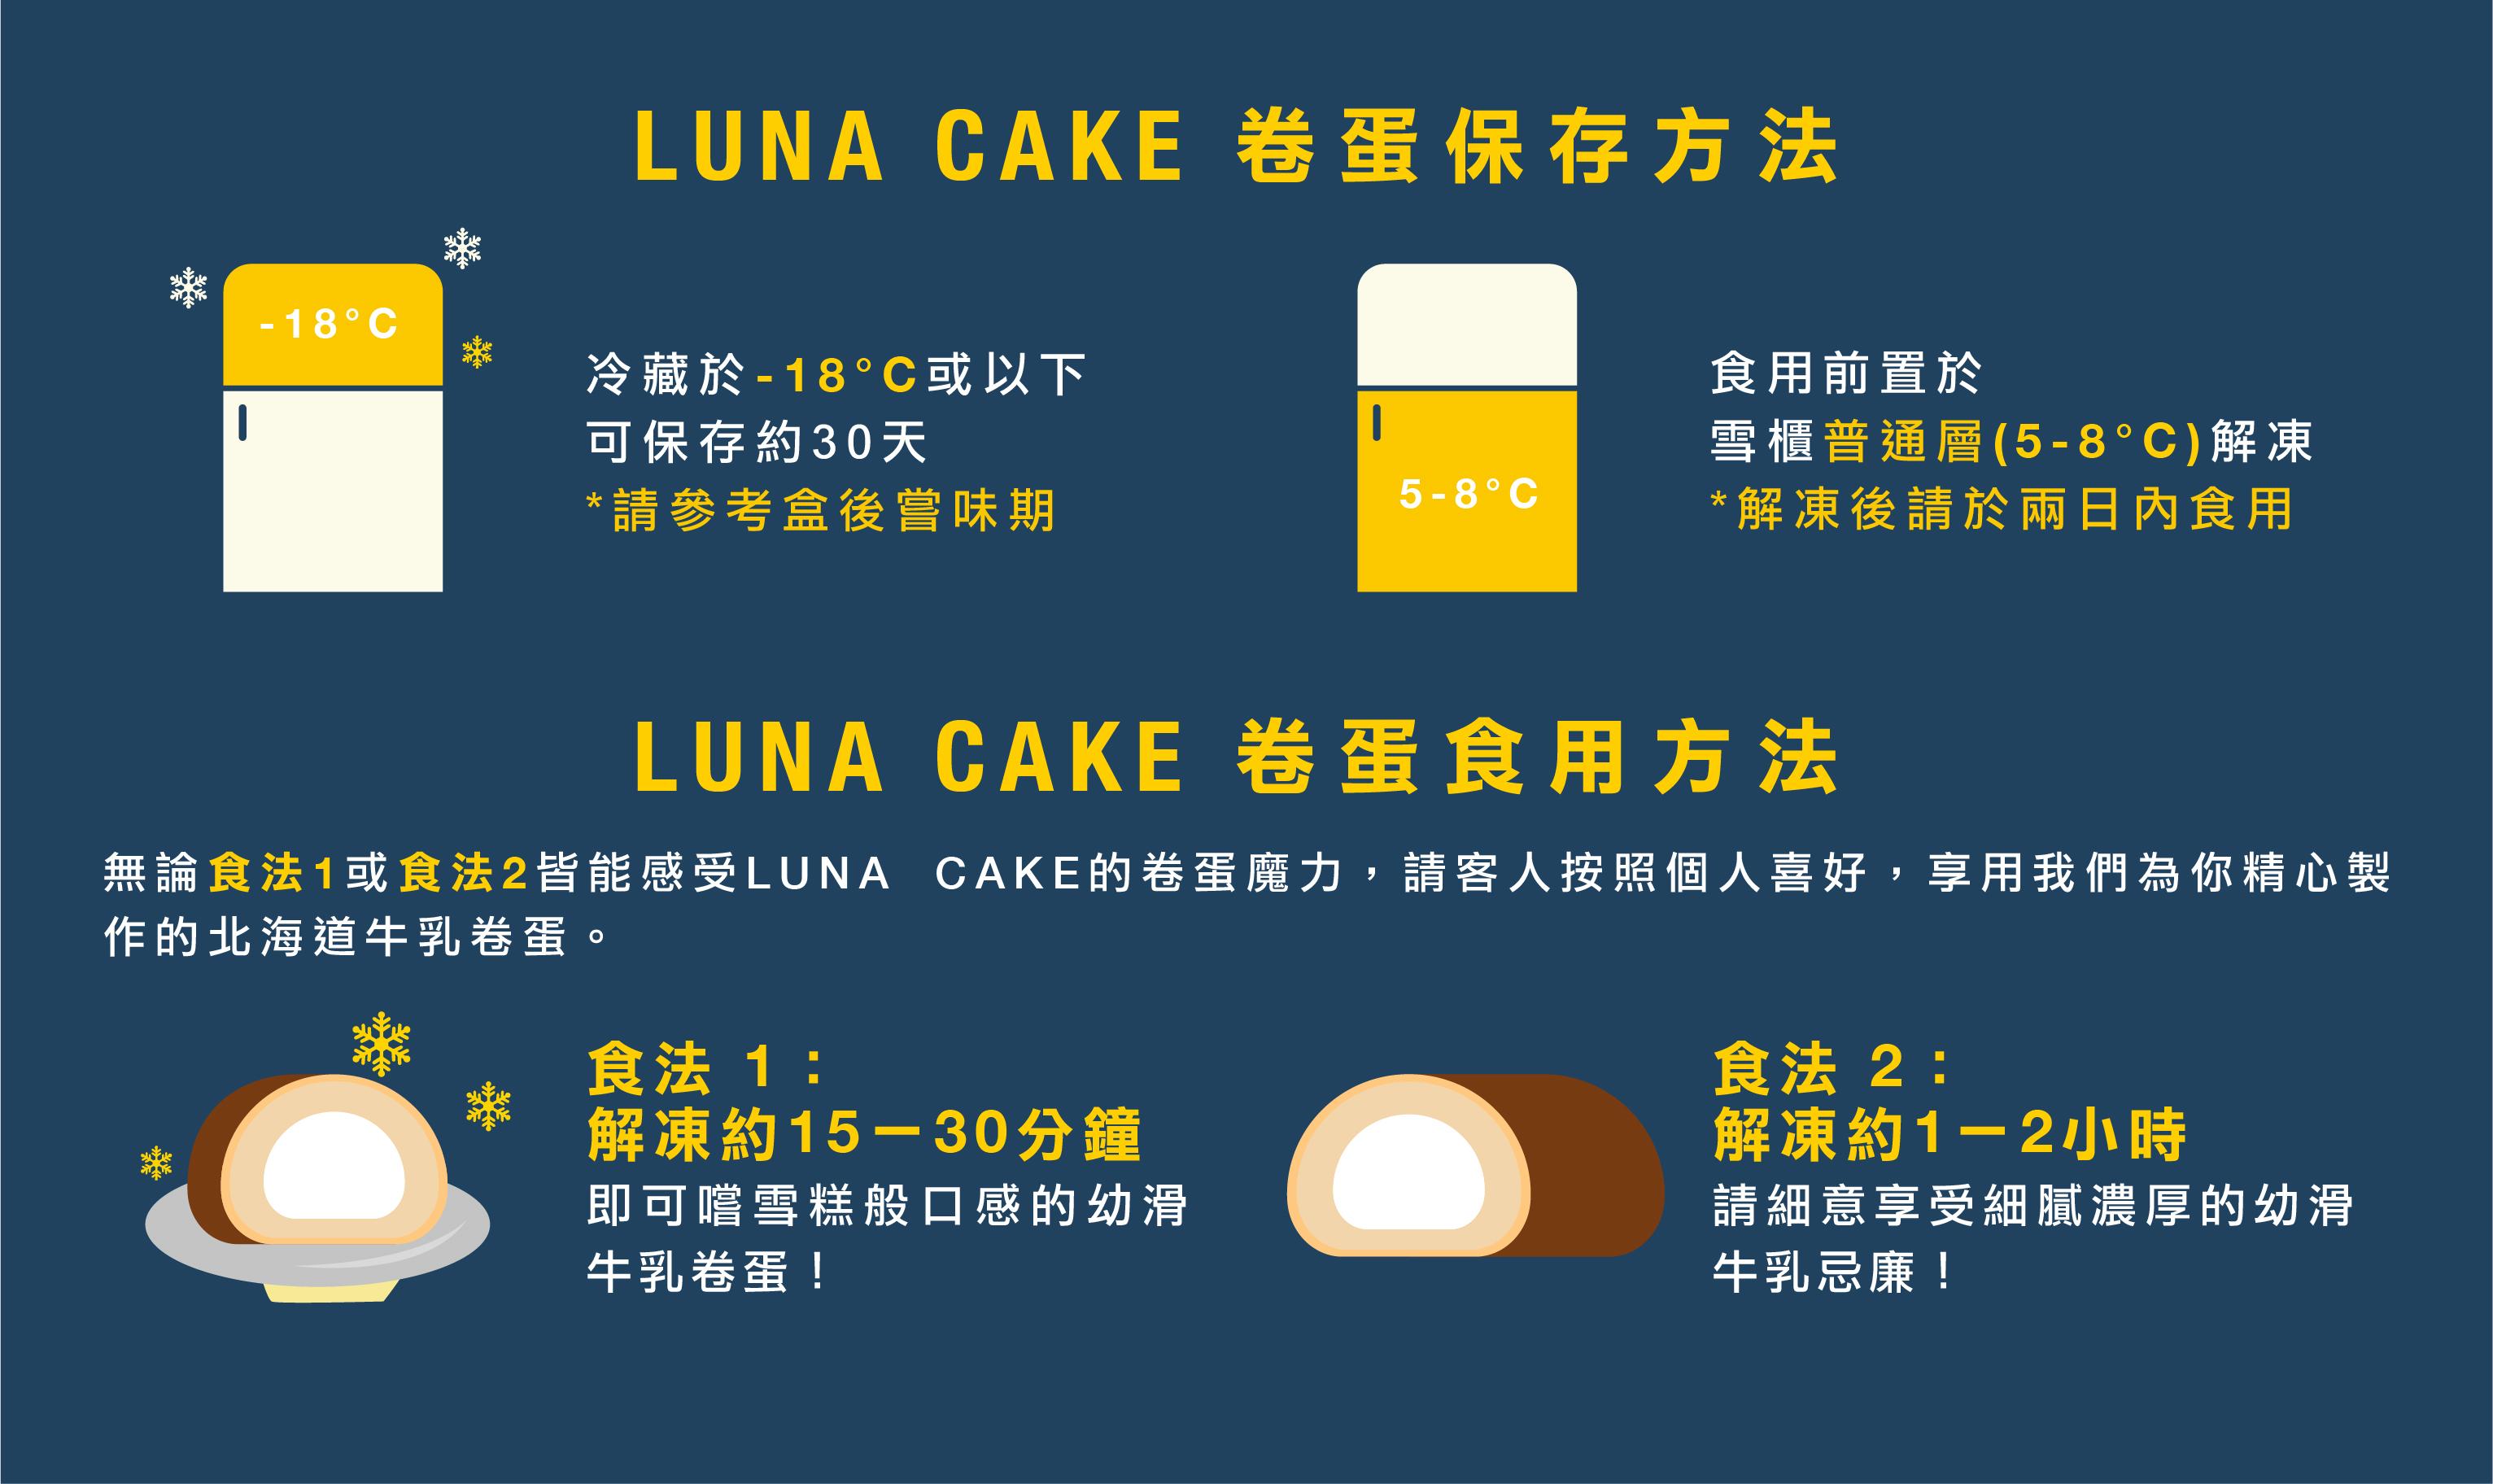 lunacake-website-method-20201019-03-aw-02.jpg